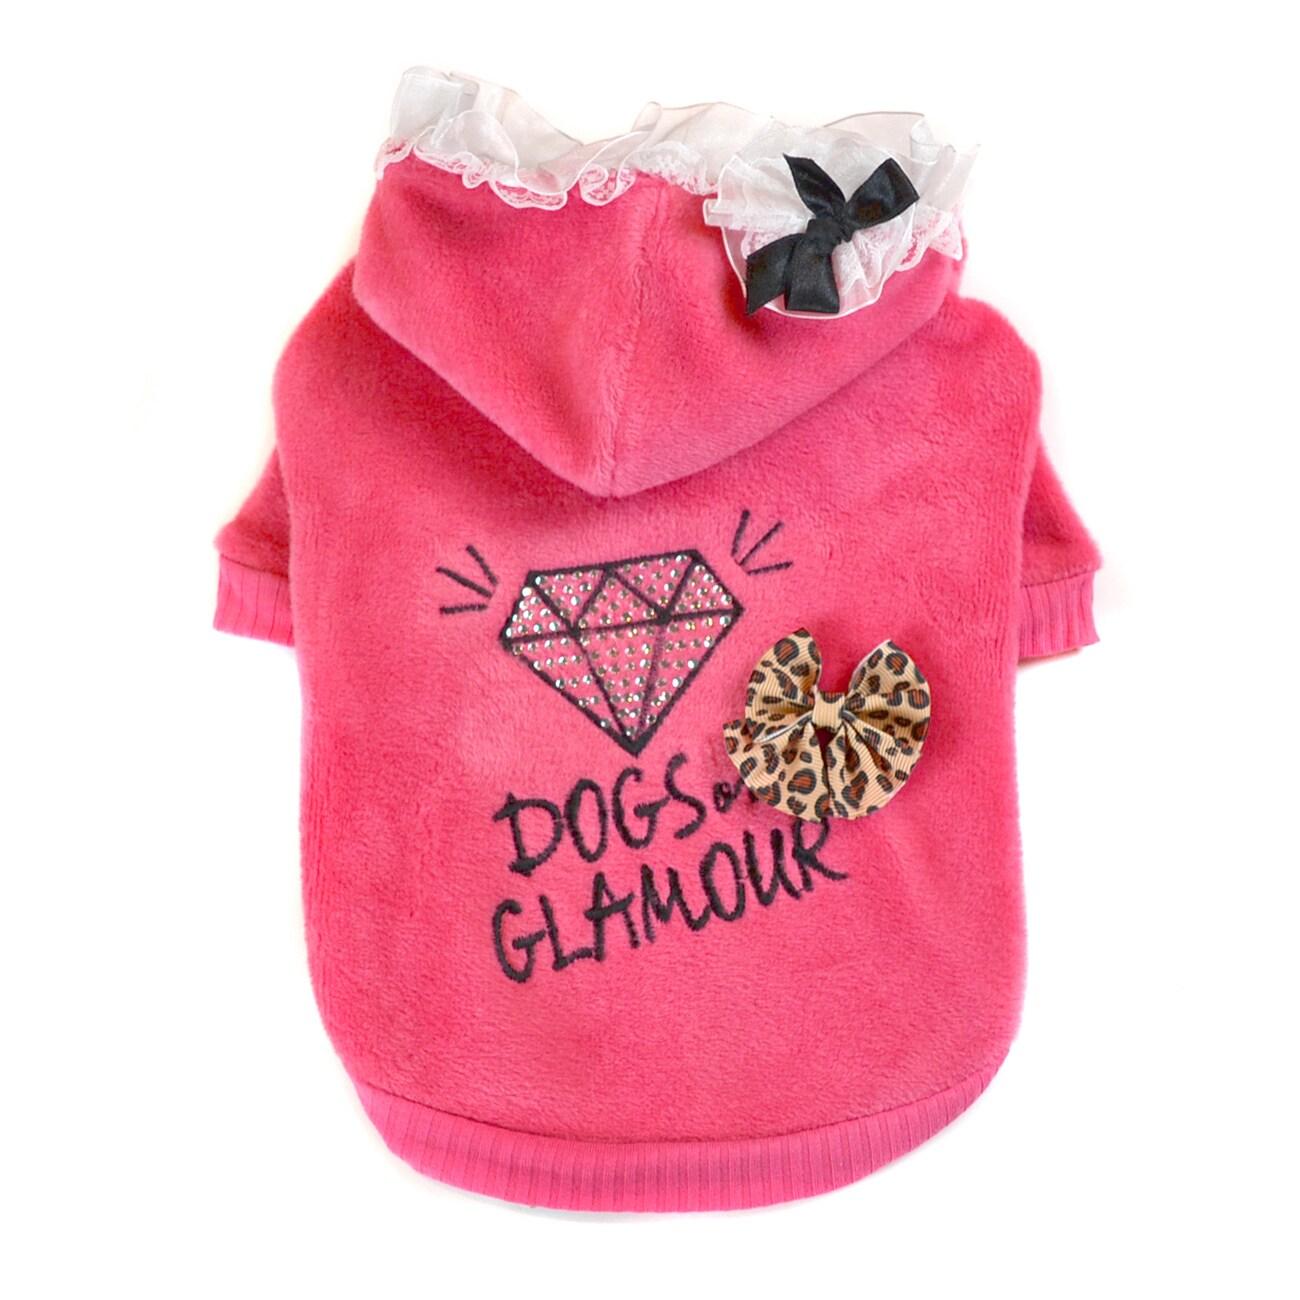 Dogs of Glamour Girly Diamond Hoodie (Medium Black Girly ...